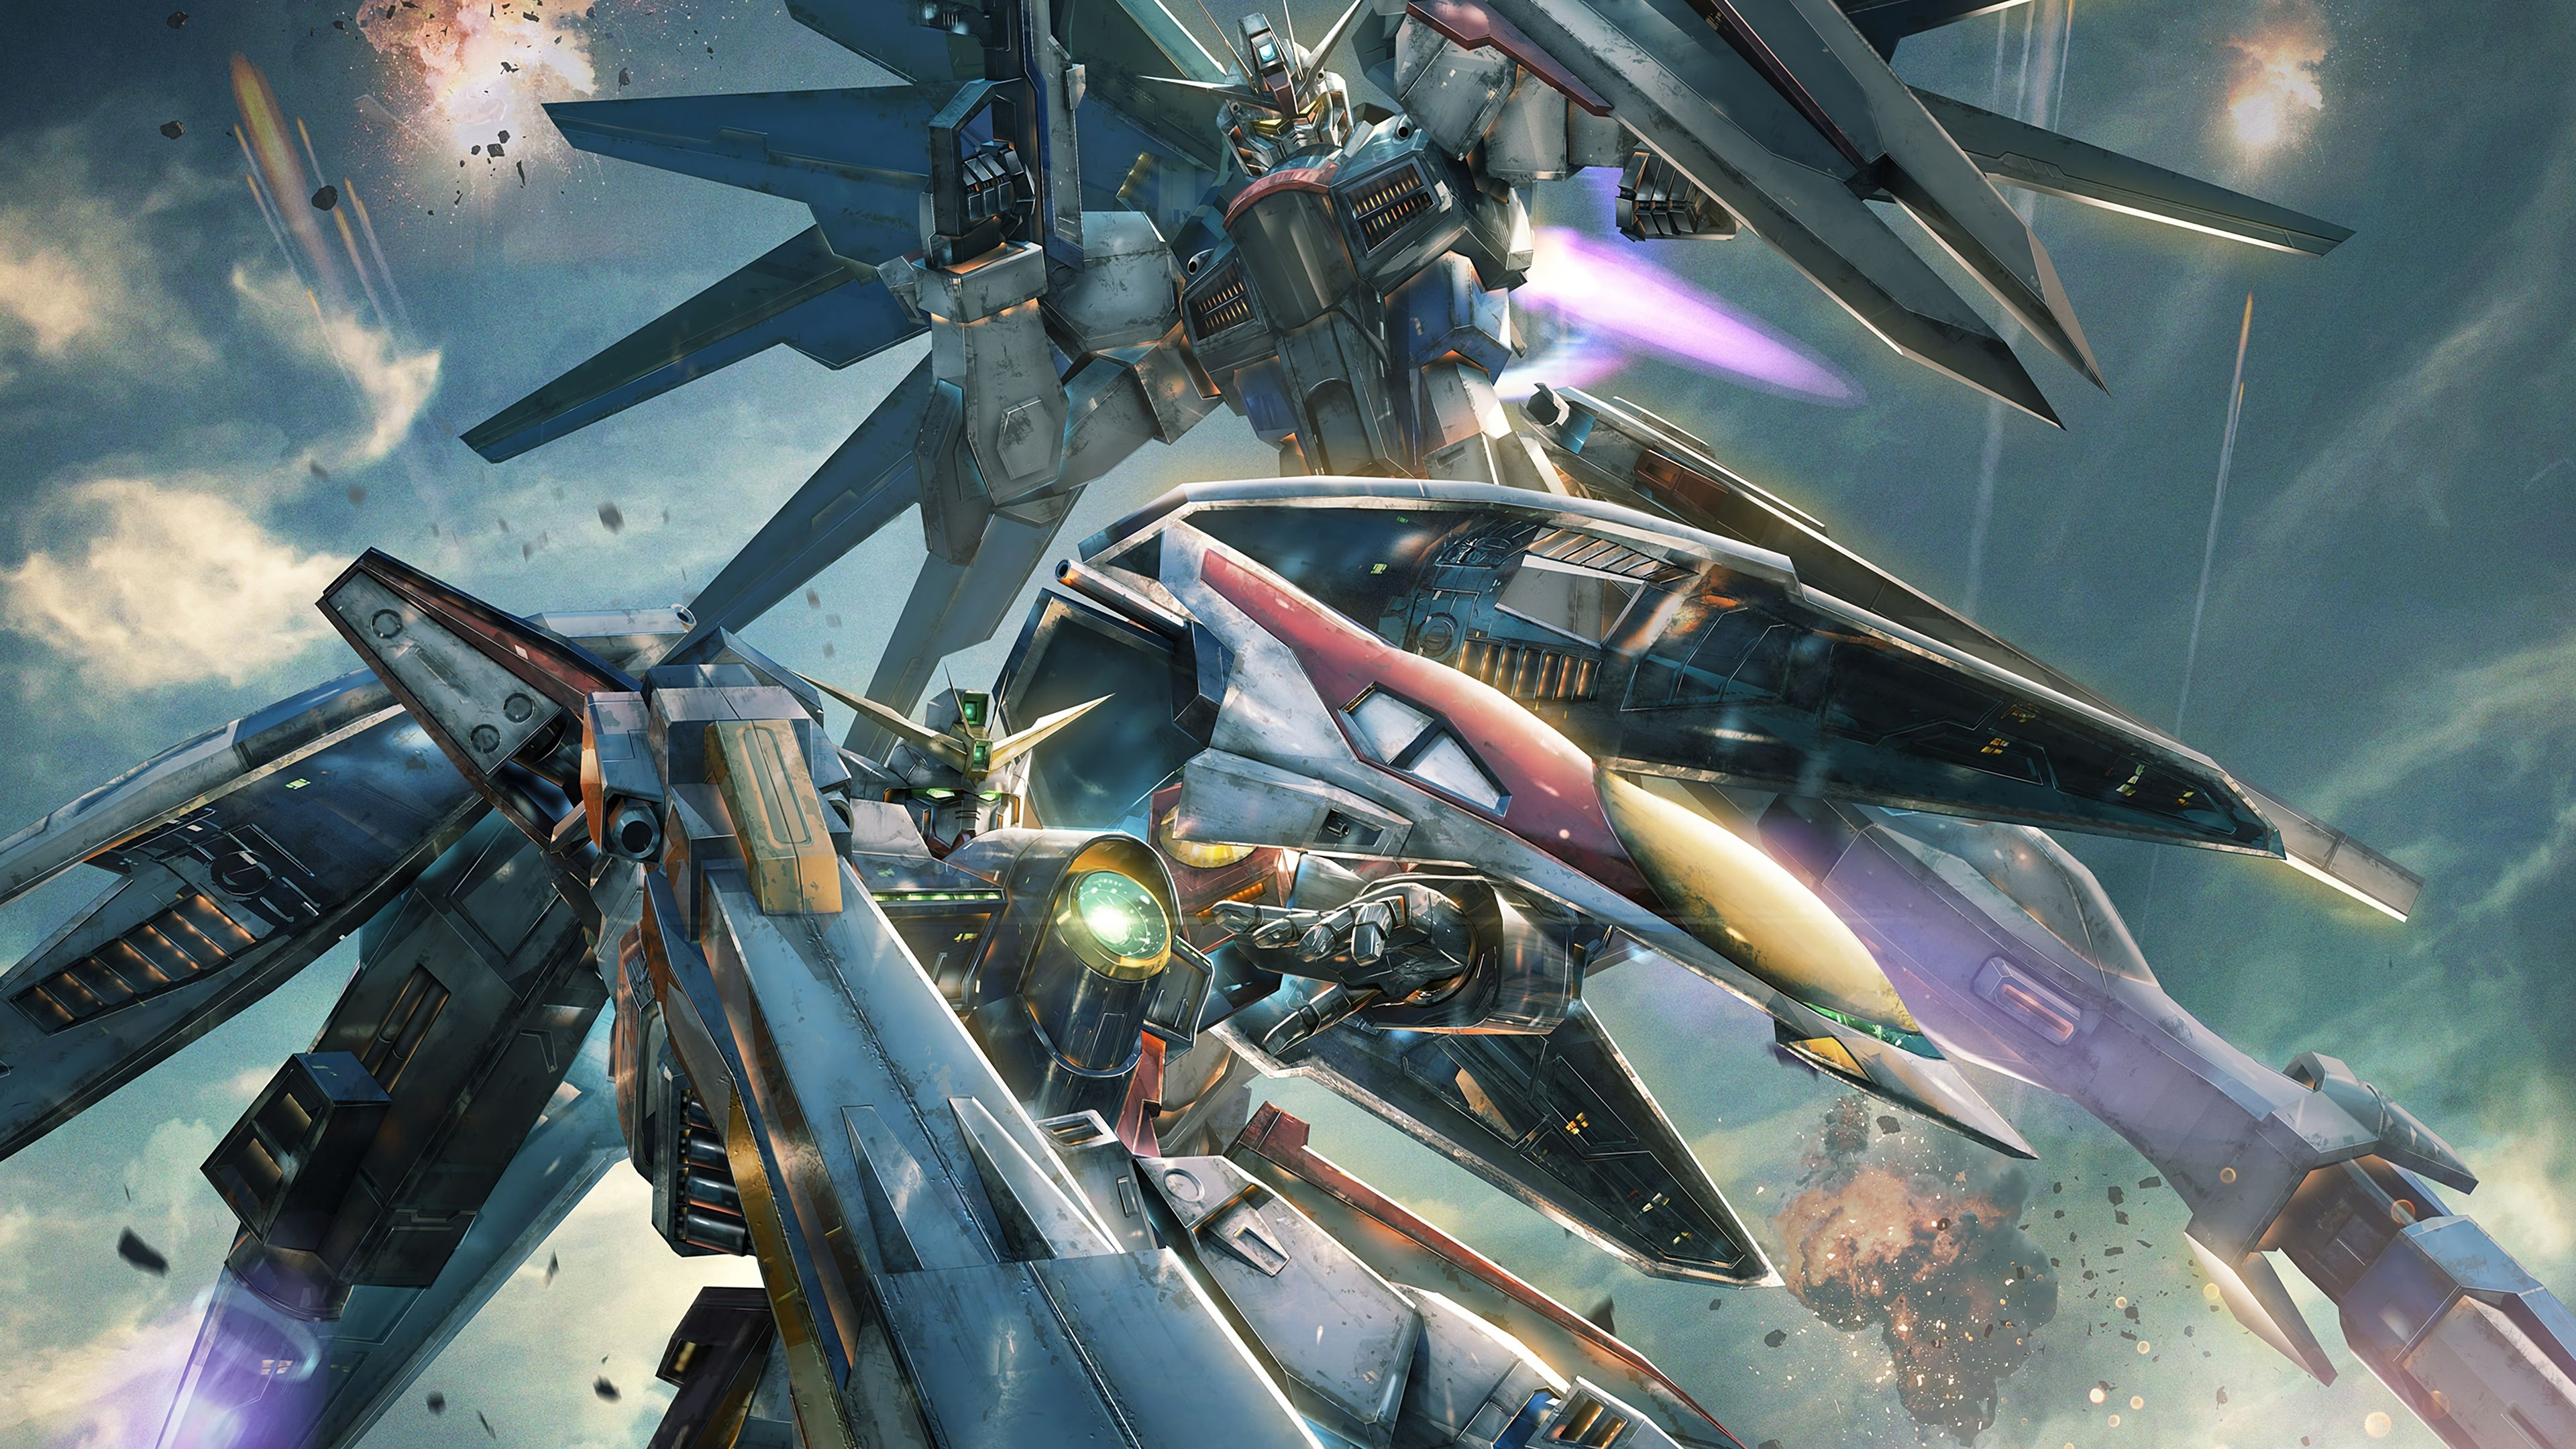 Cool Gundam Versus 4K PlayStation 4 (PS4) Game 3840x2160